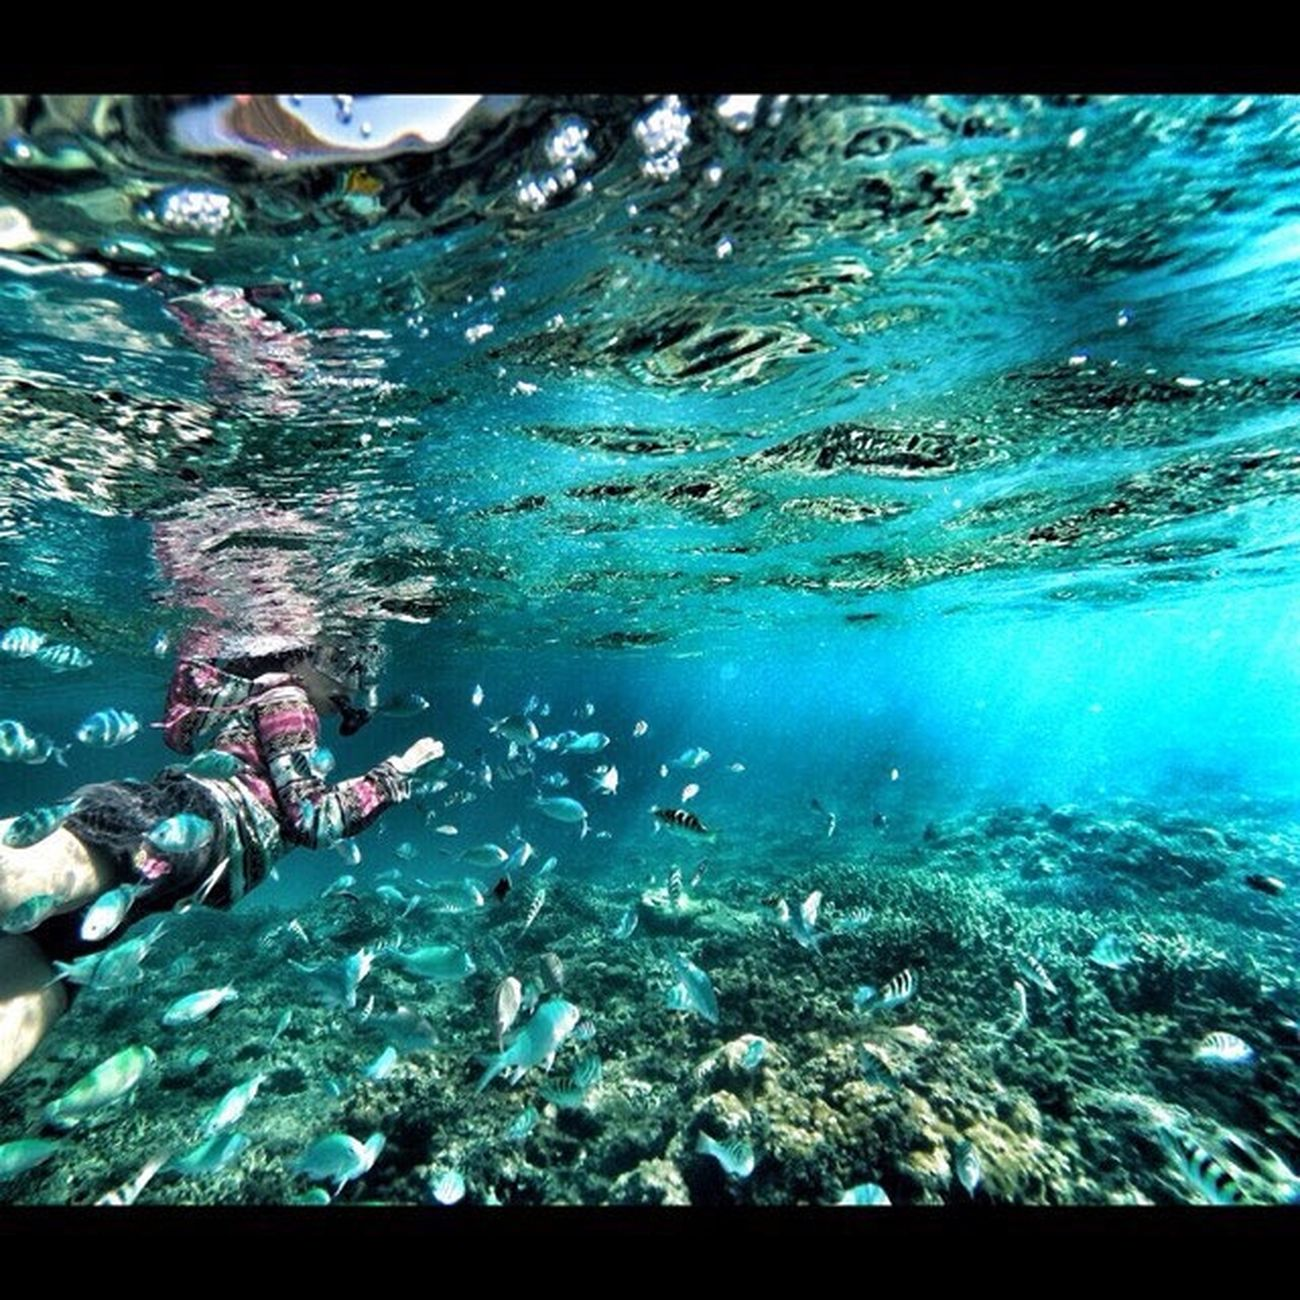 Gopro F4F HDR Followback Tokashiki 渡嘉敷島 沖縄 Japan Sea Snorkeling